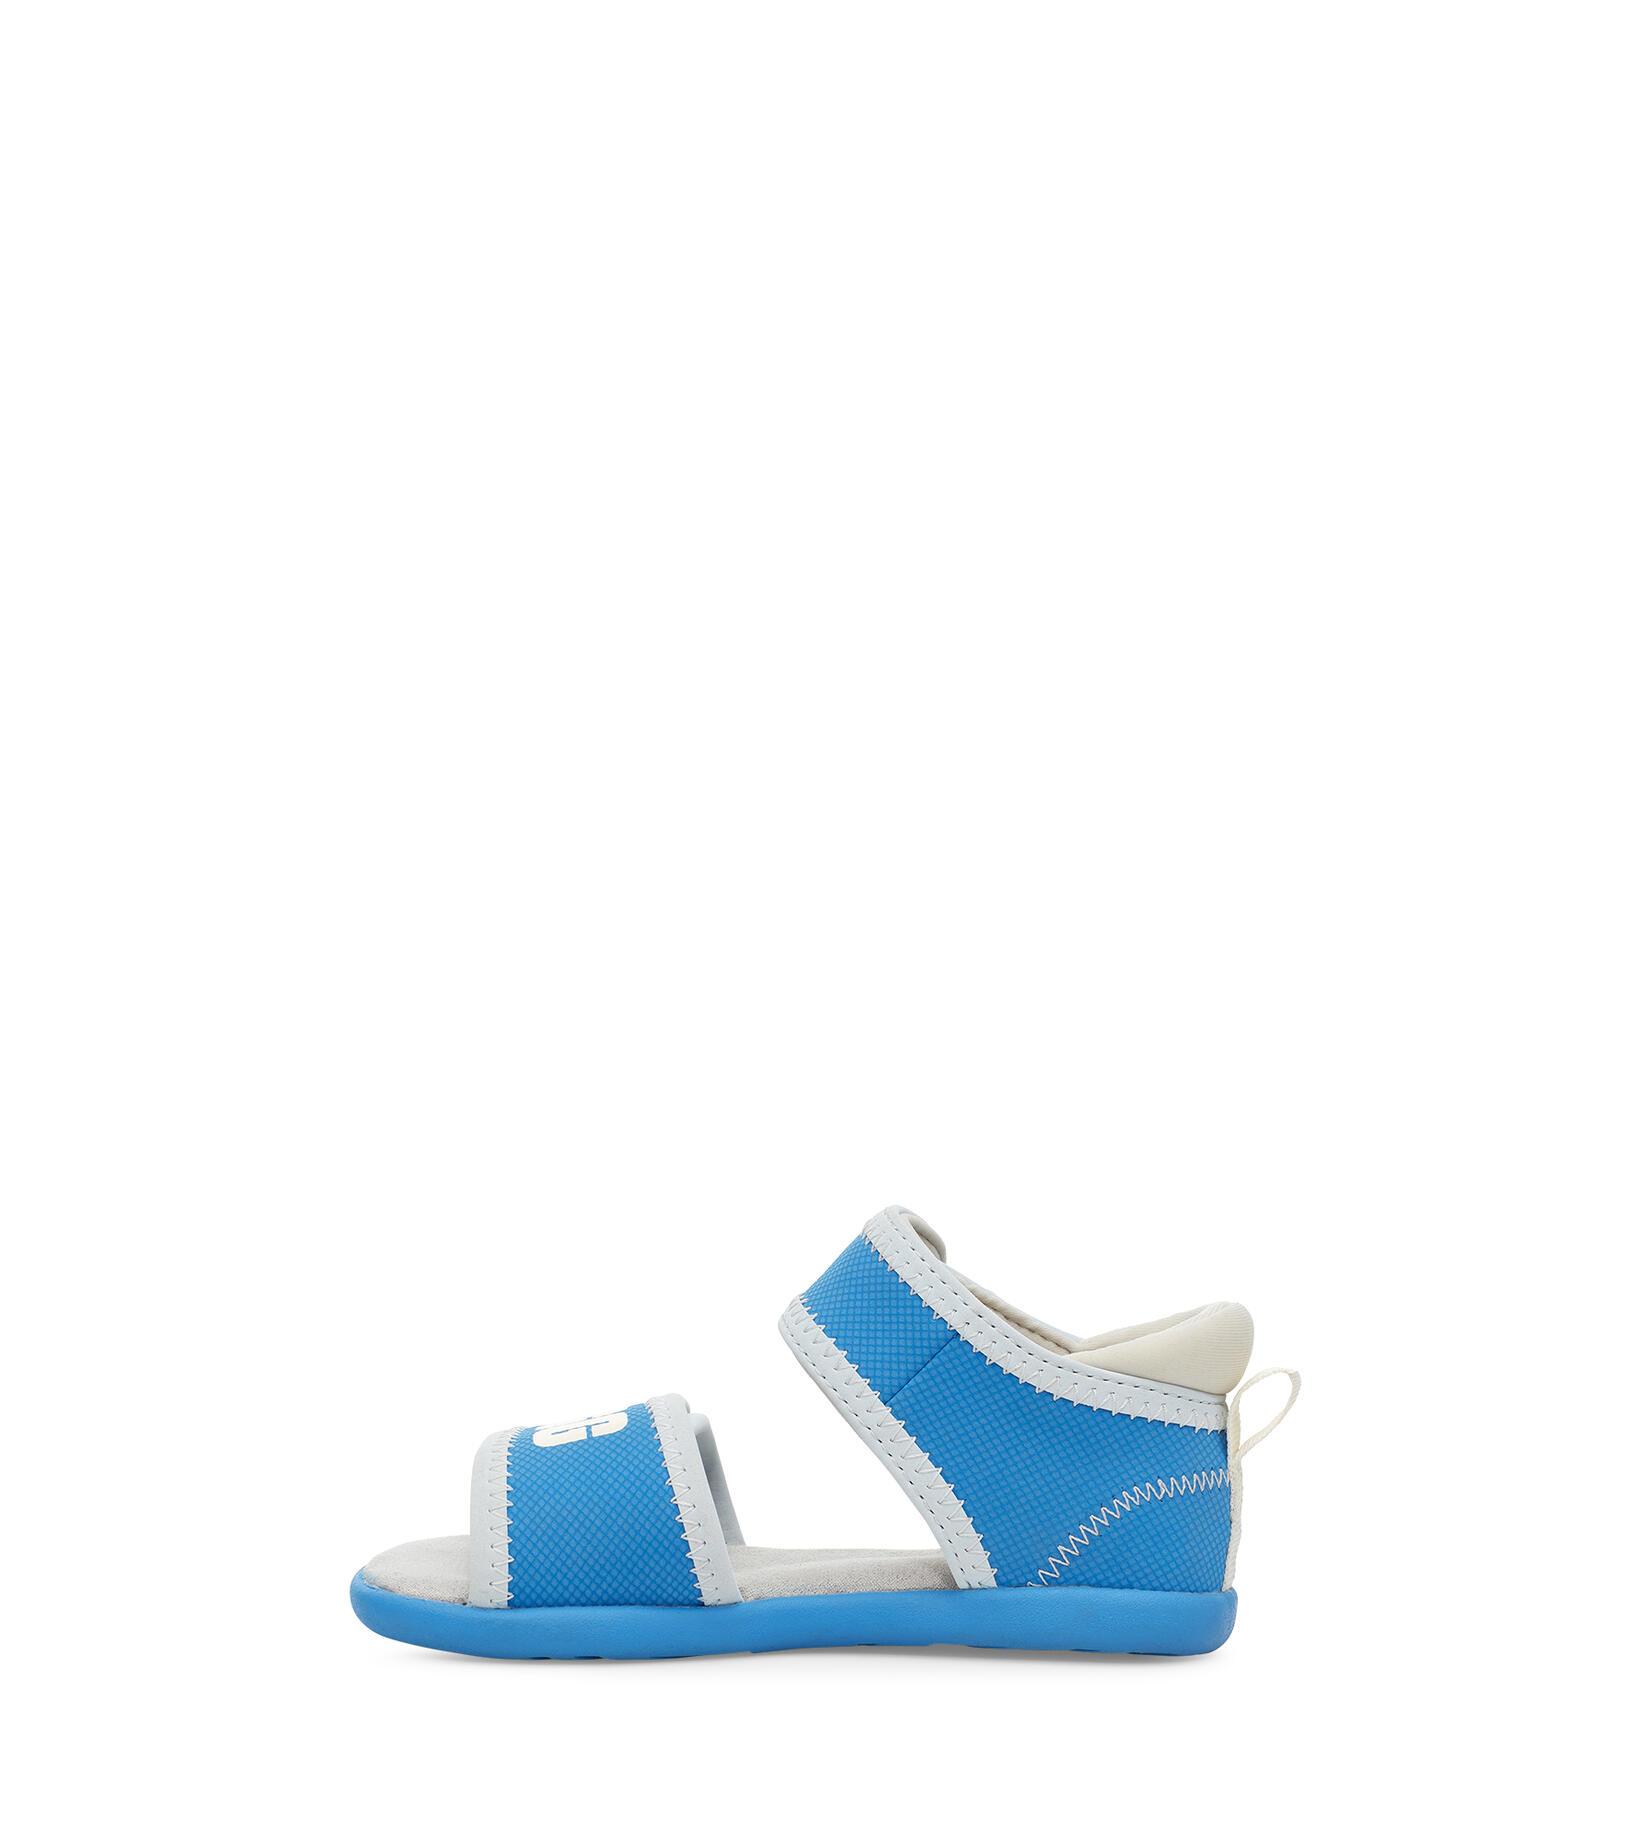 Delta Sandal